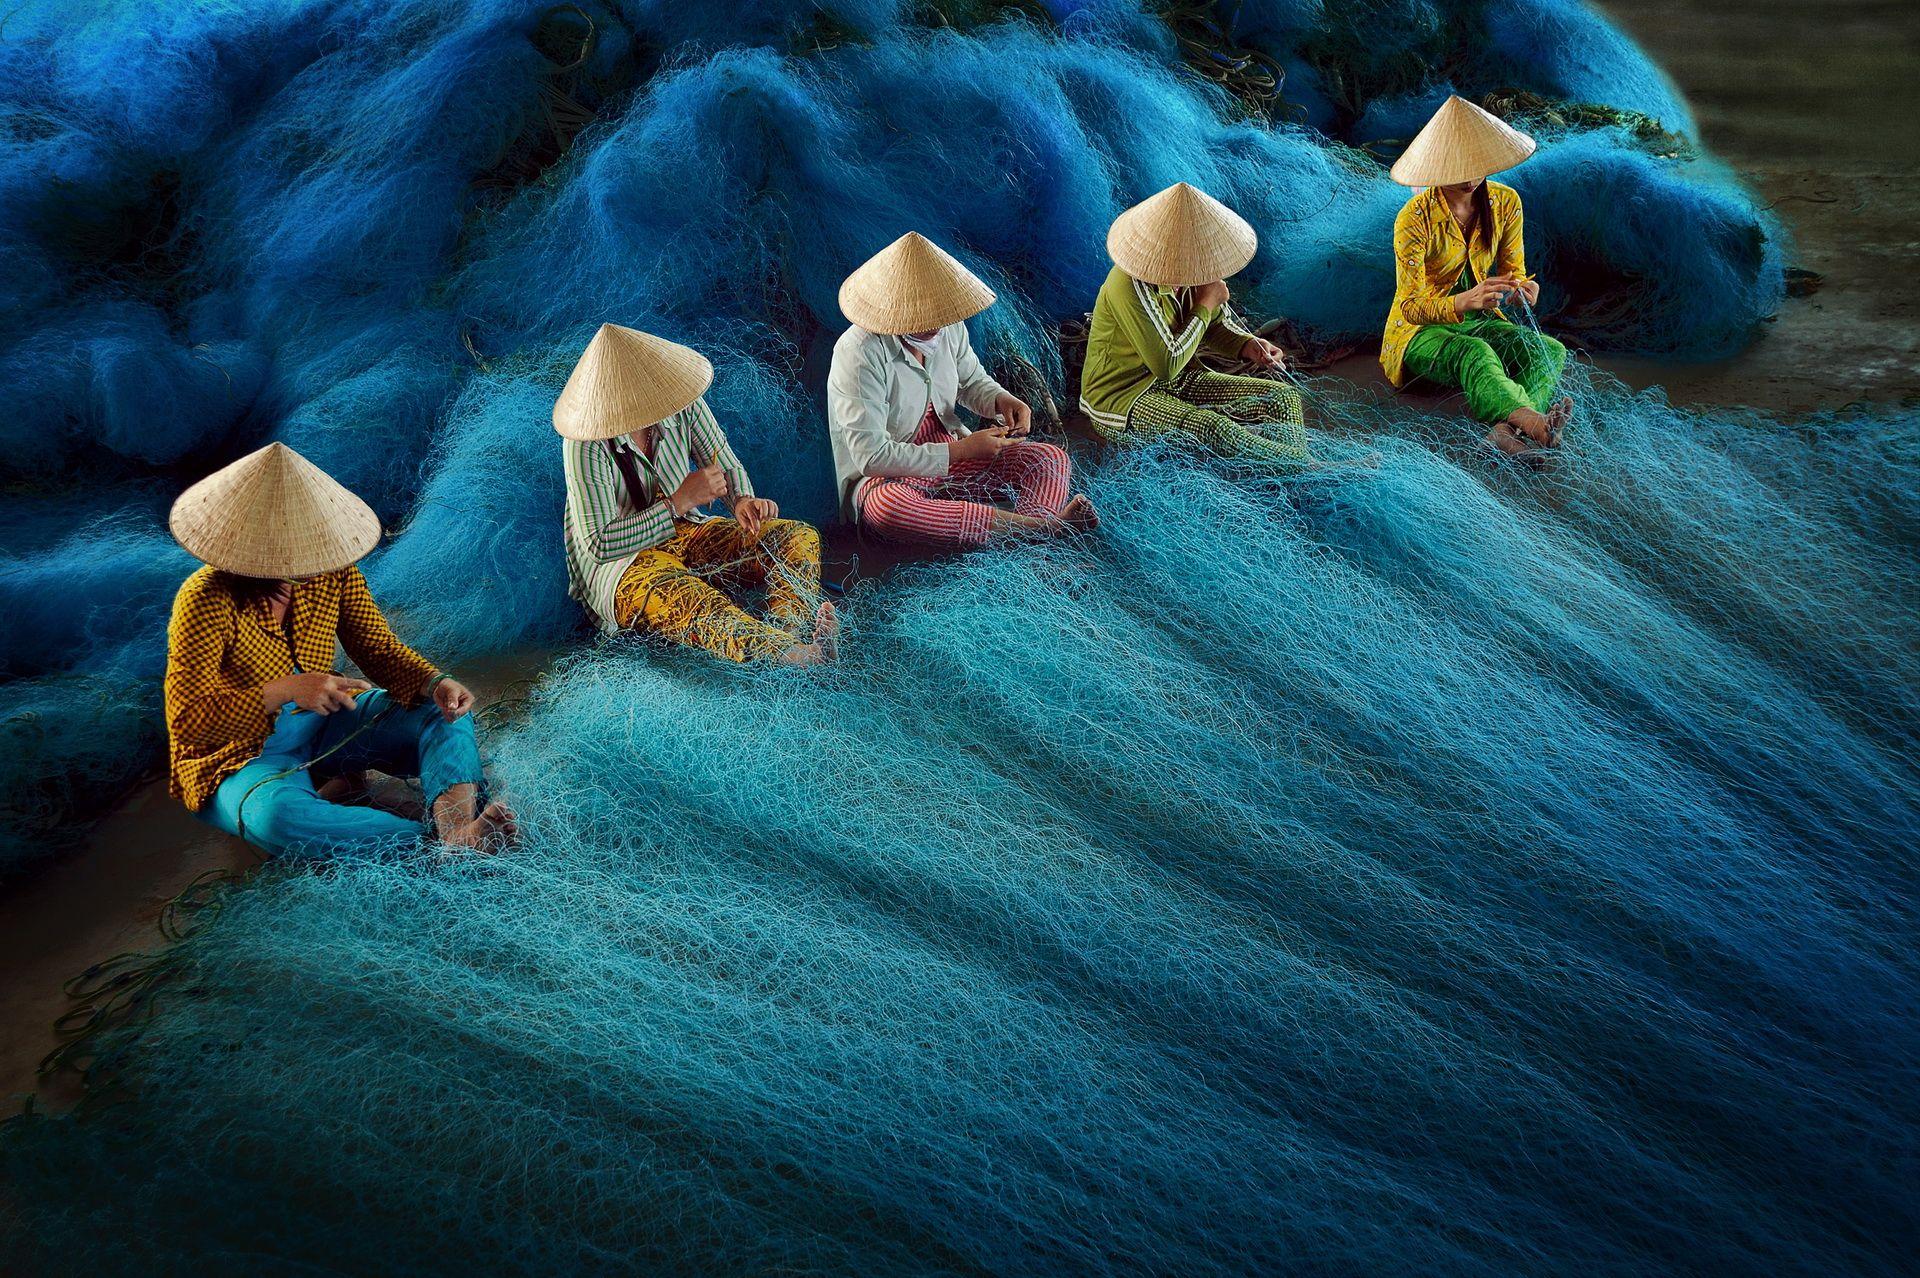 Net Mending by Hoang Long Ly